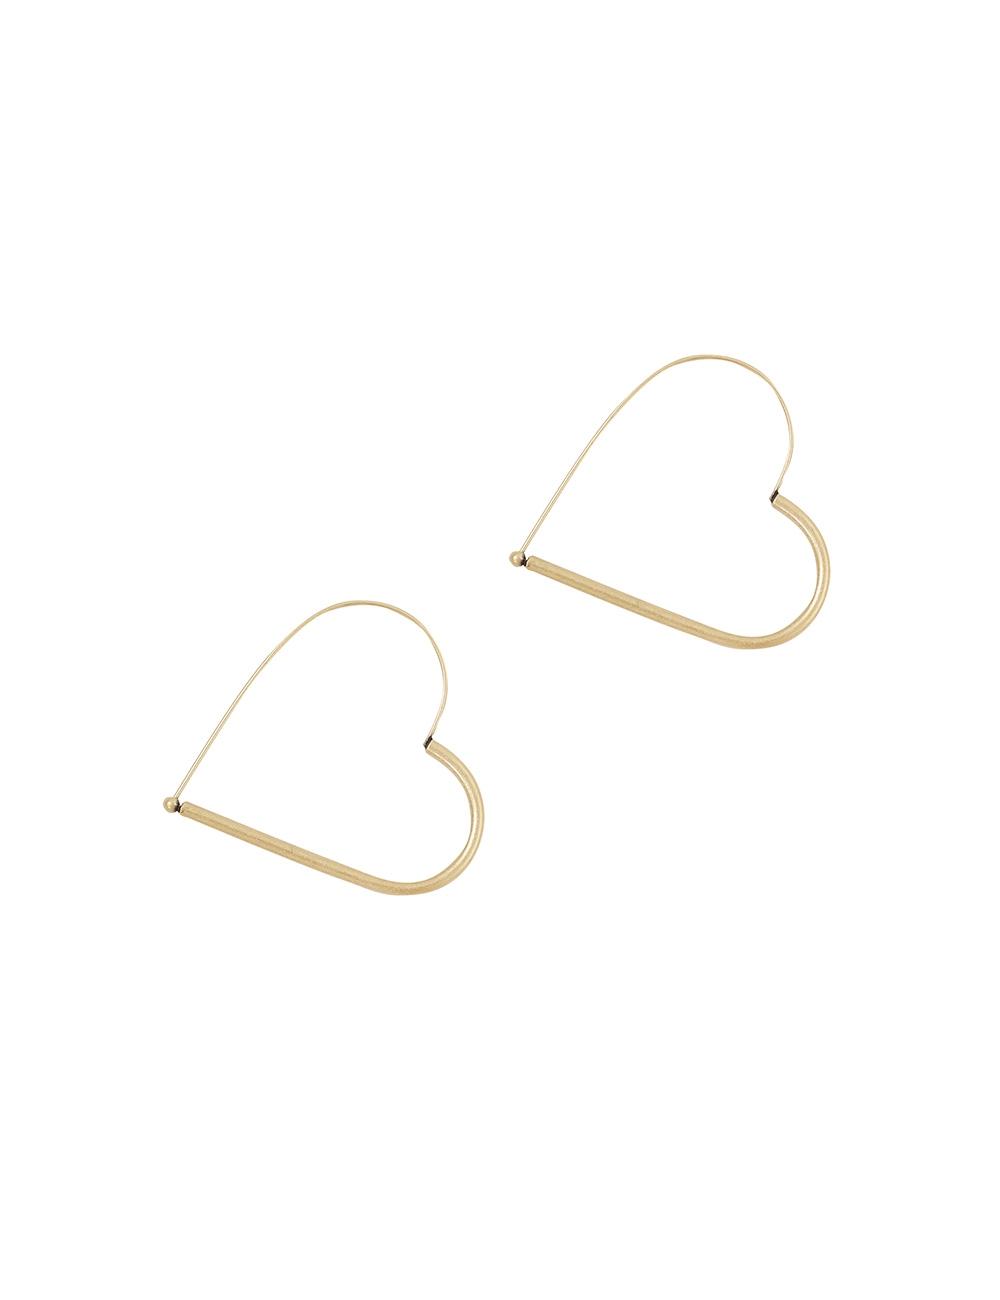 The Lovestruck Mini Hoop